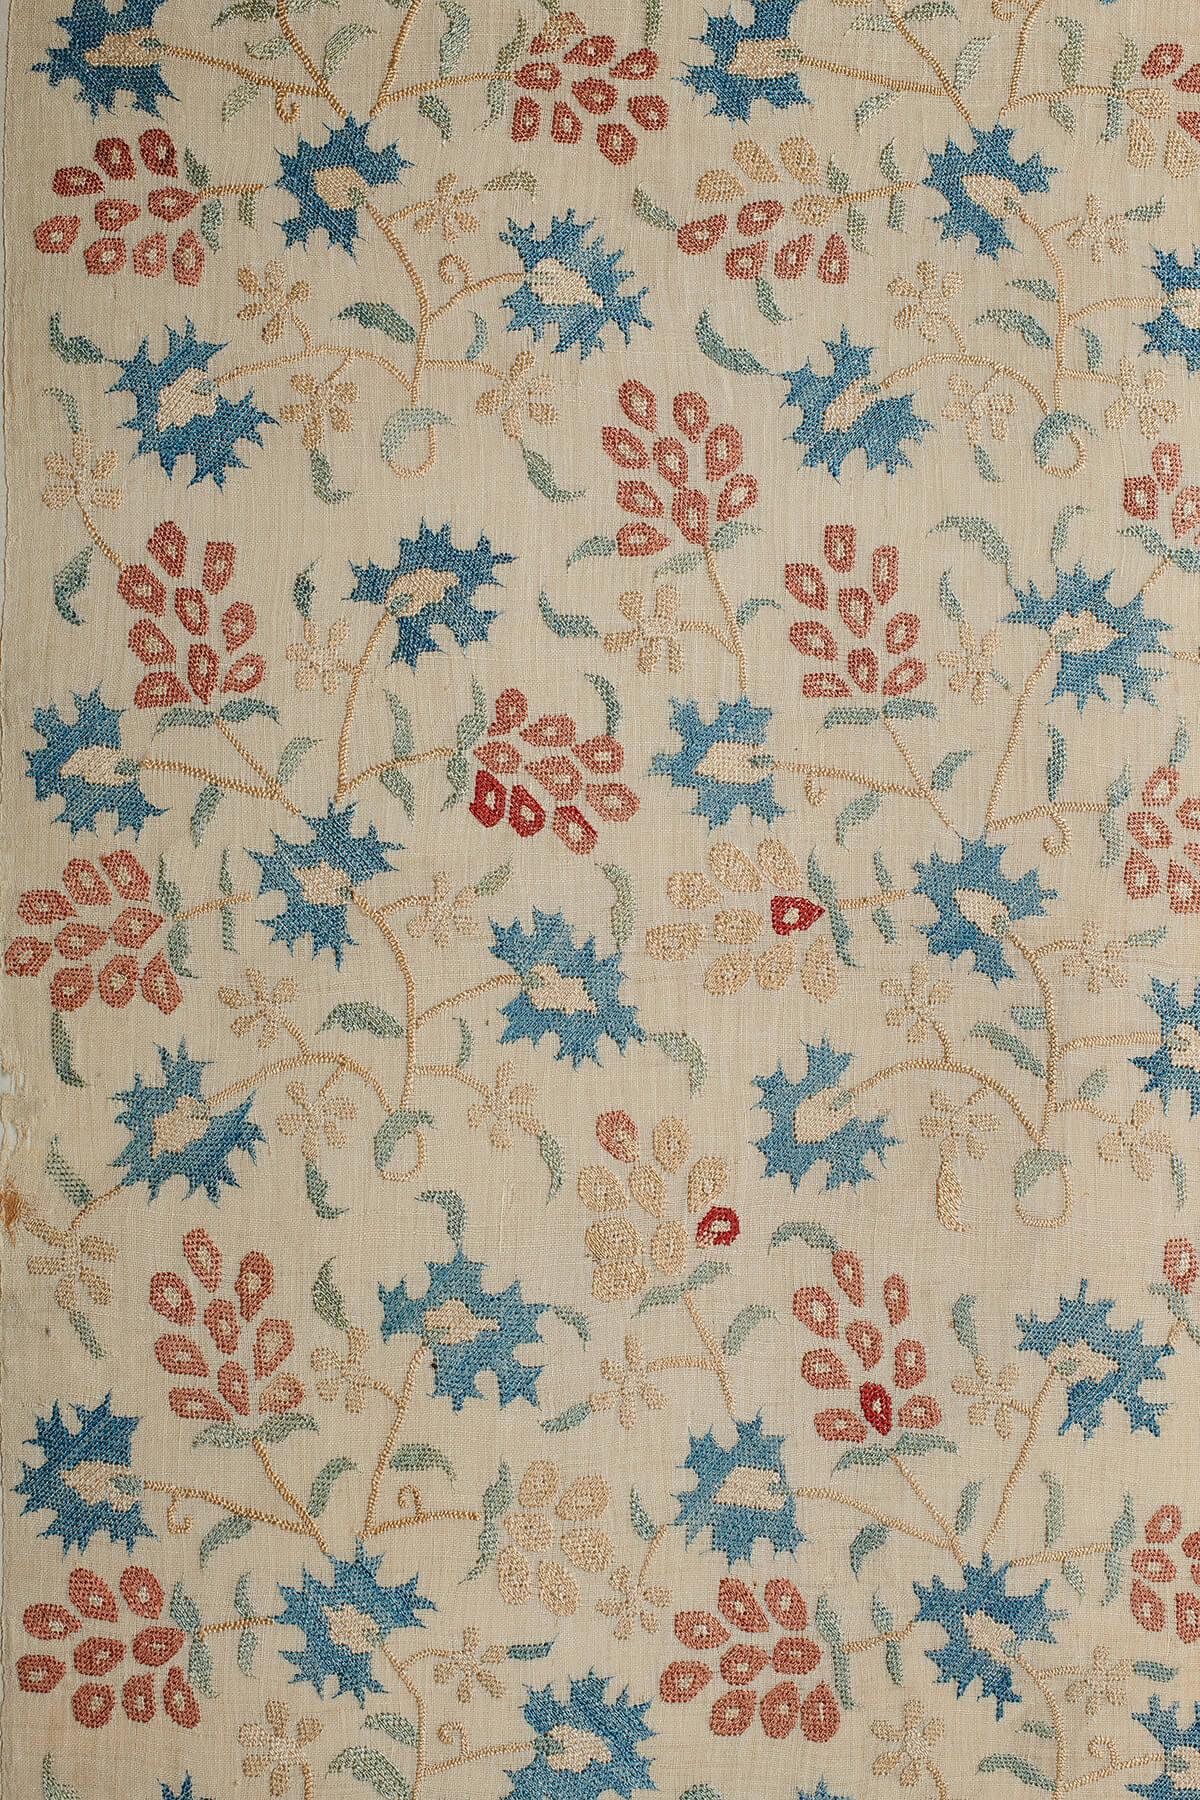 Panneau textile ottoman